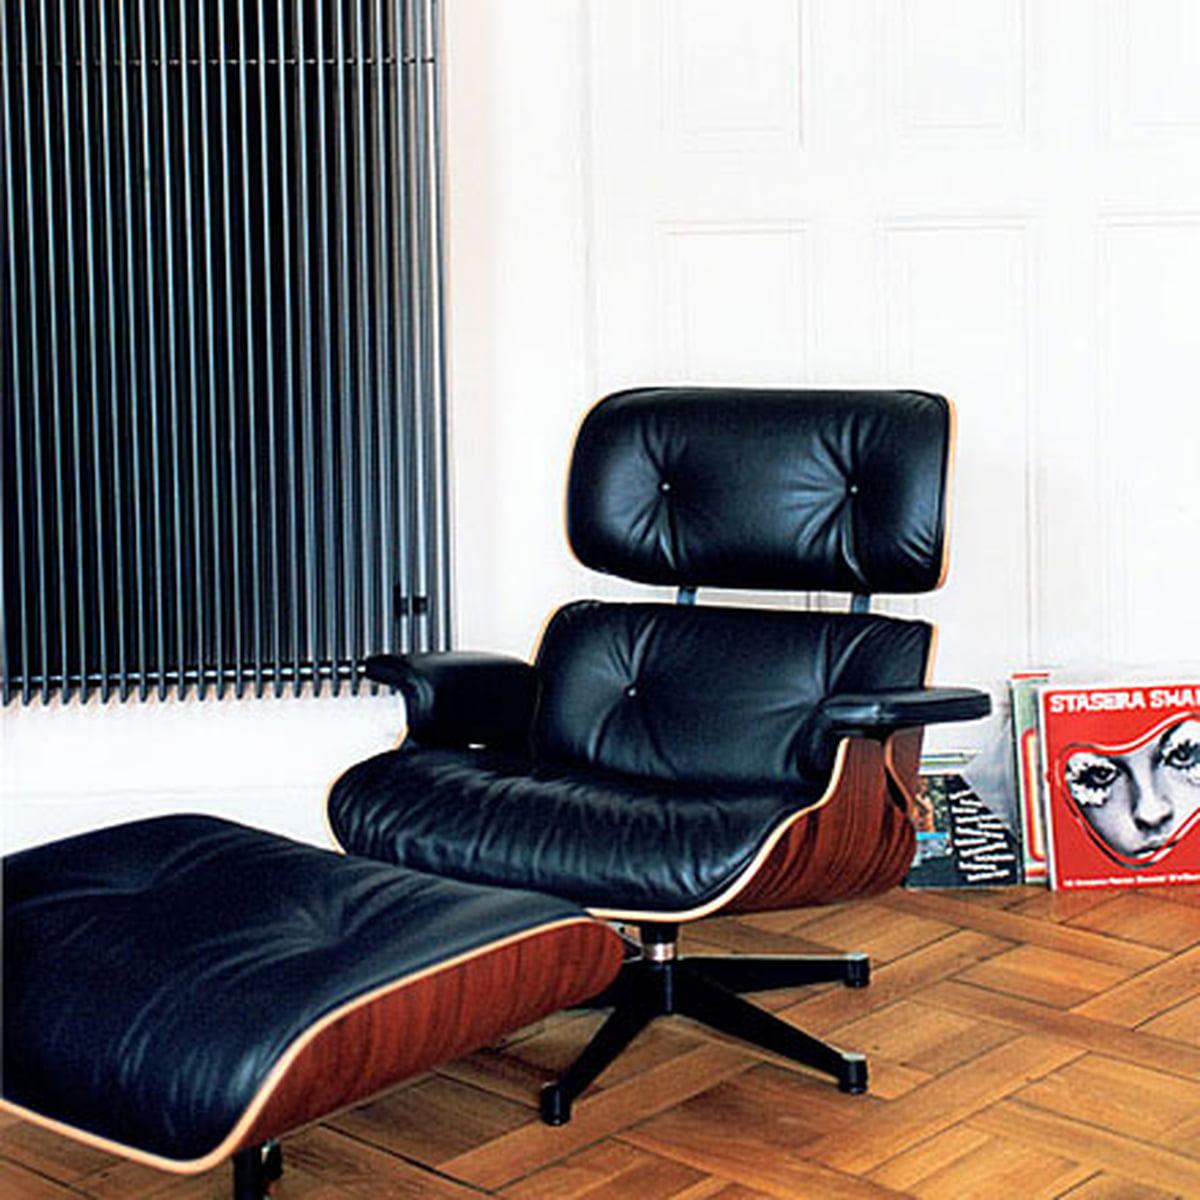 vitra lounge chair bei kaufen. Black Bedroom Furniture Sets. Home Design Ideas